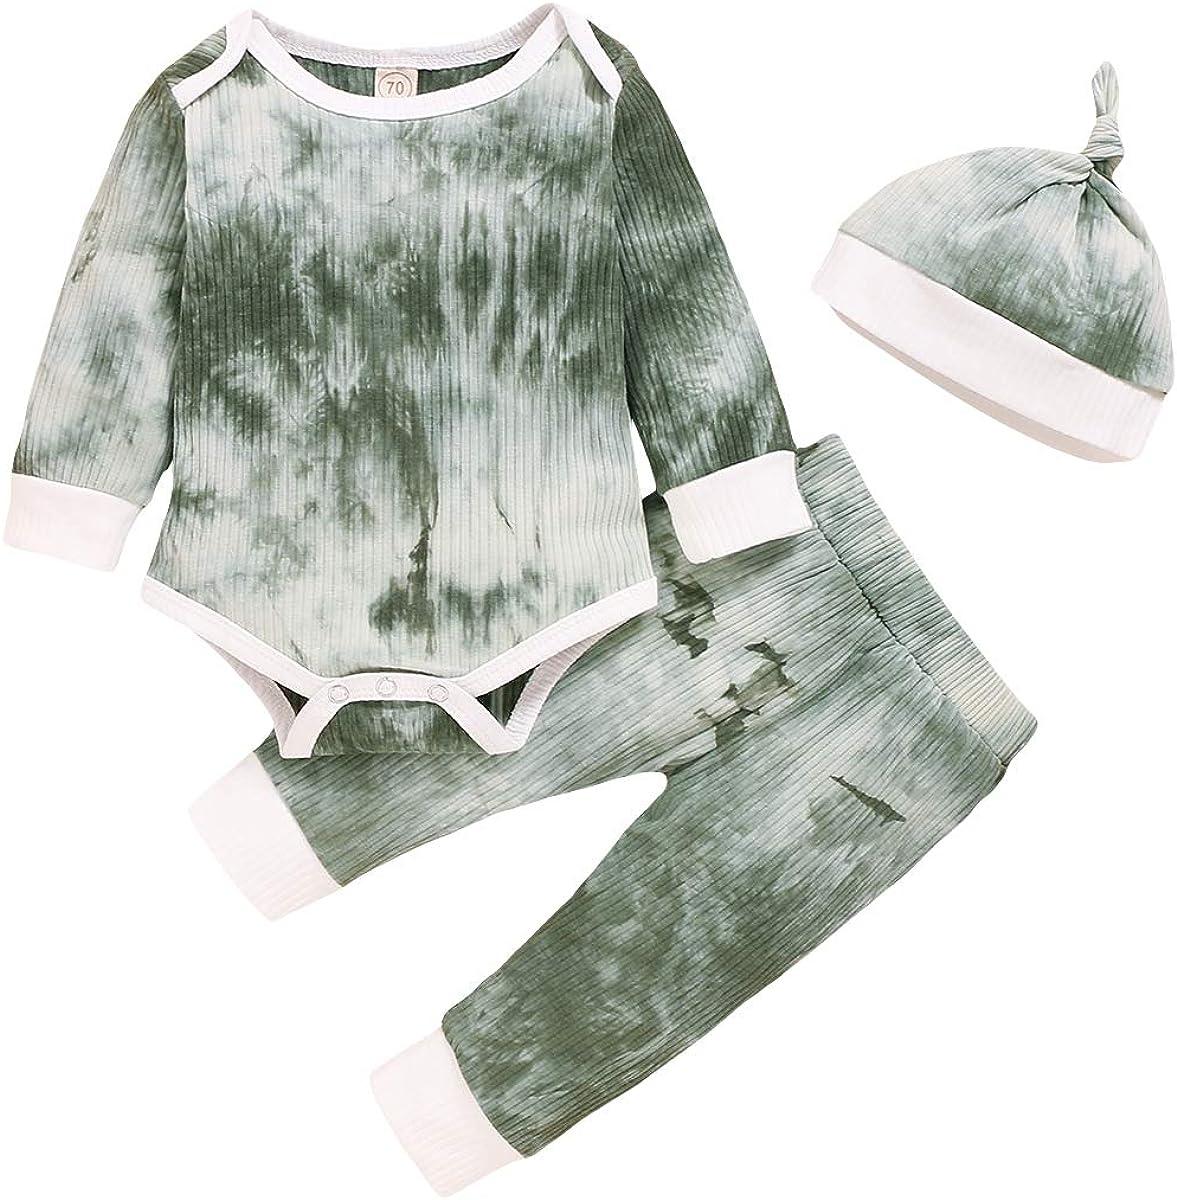 Newborn Toddler Baby Boy 3Pcs Tie Dye Fall Winter Outfit Long Sleeve Romper Bodysuit Top Pants Hat Clothes Set